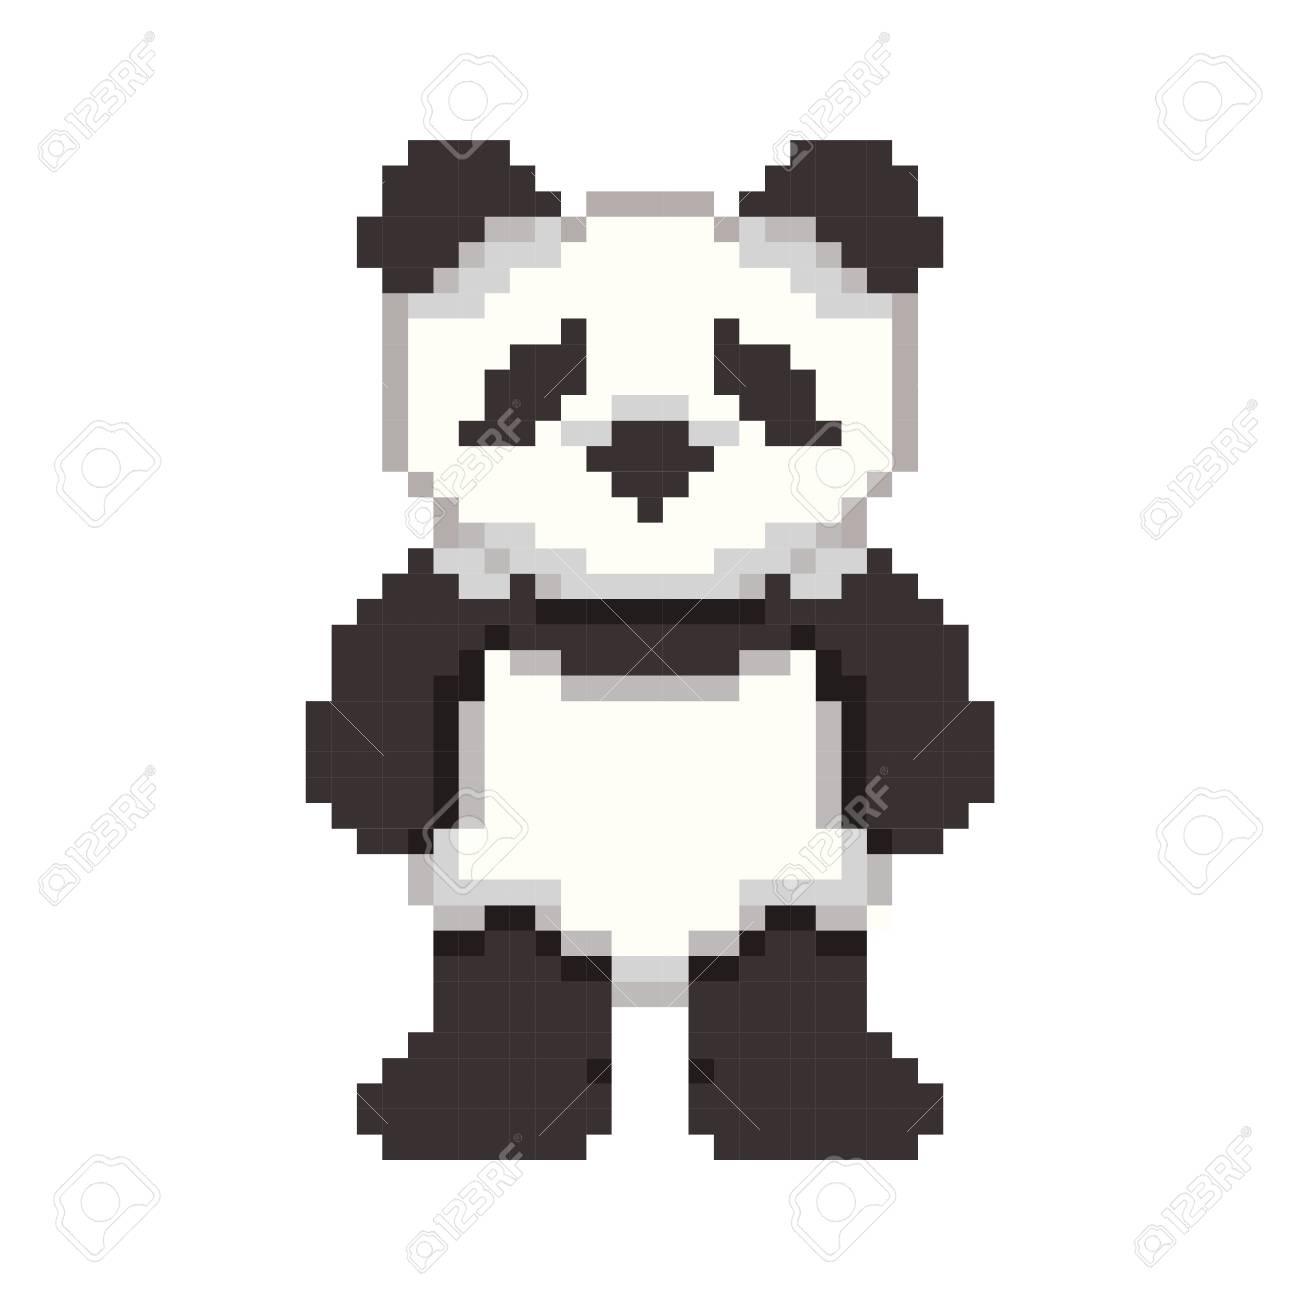 Pixel Art Panda Royalty Free Cliparts Vectors And Stock